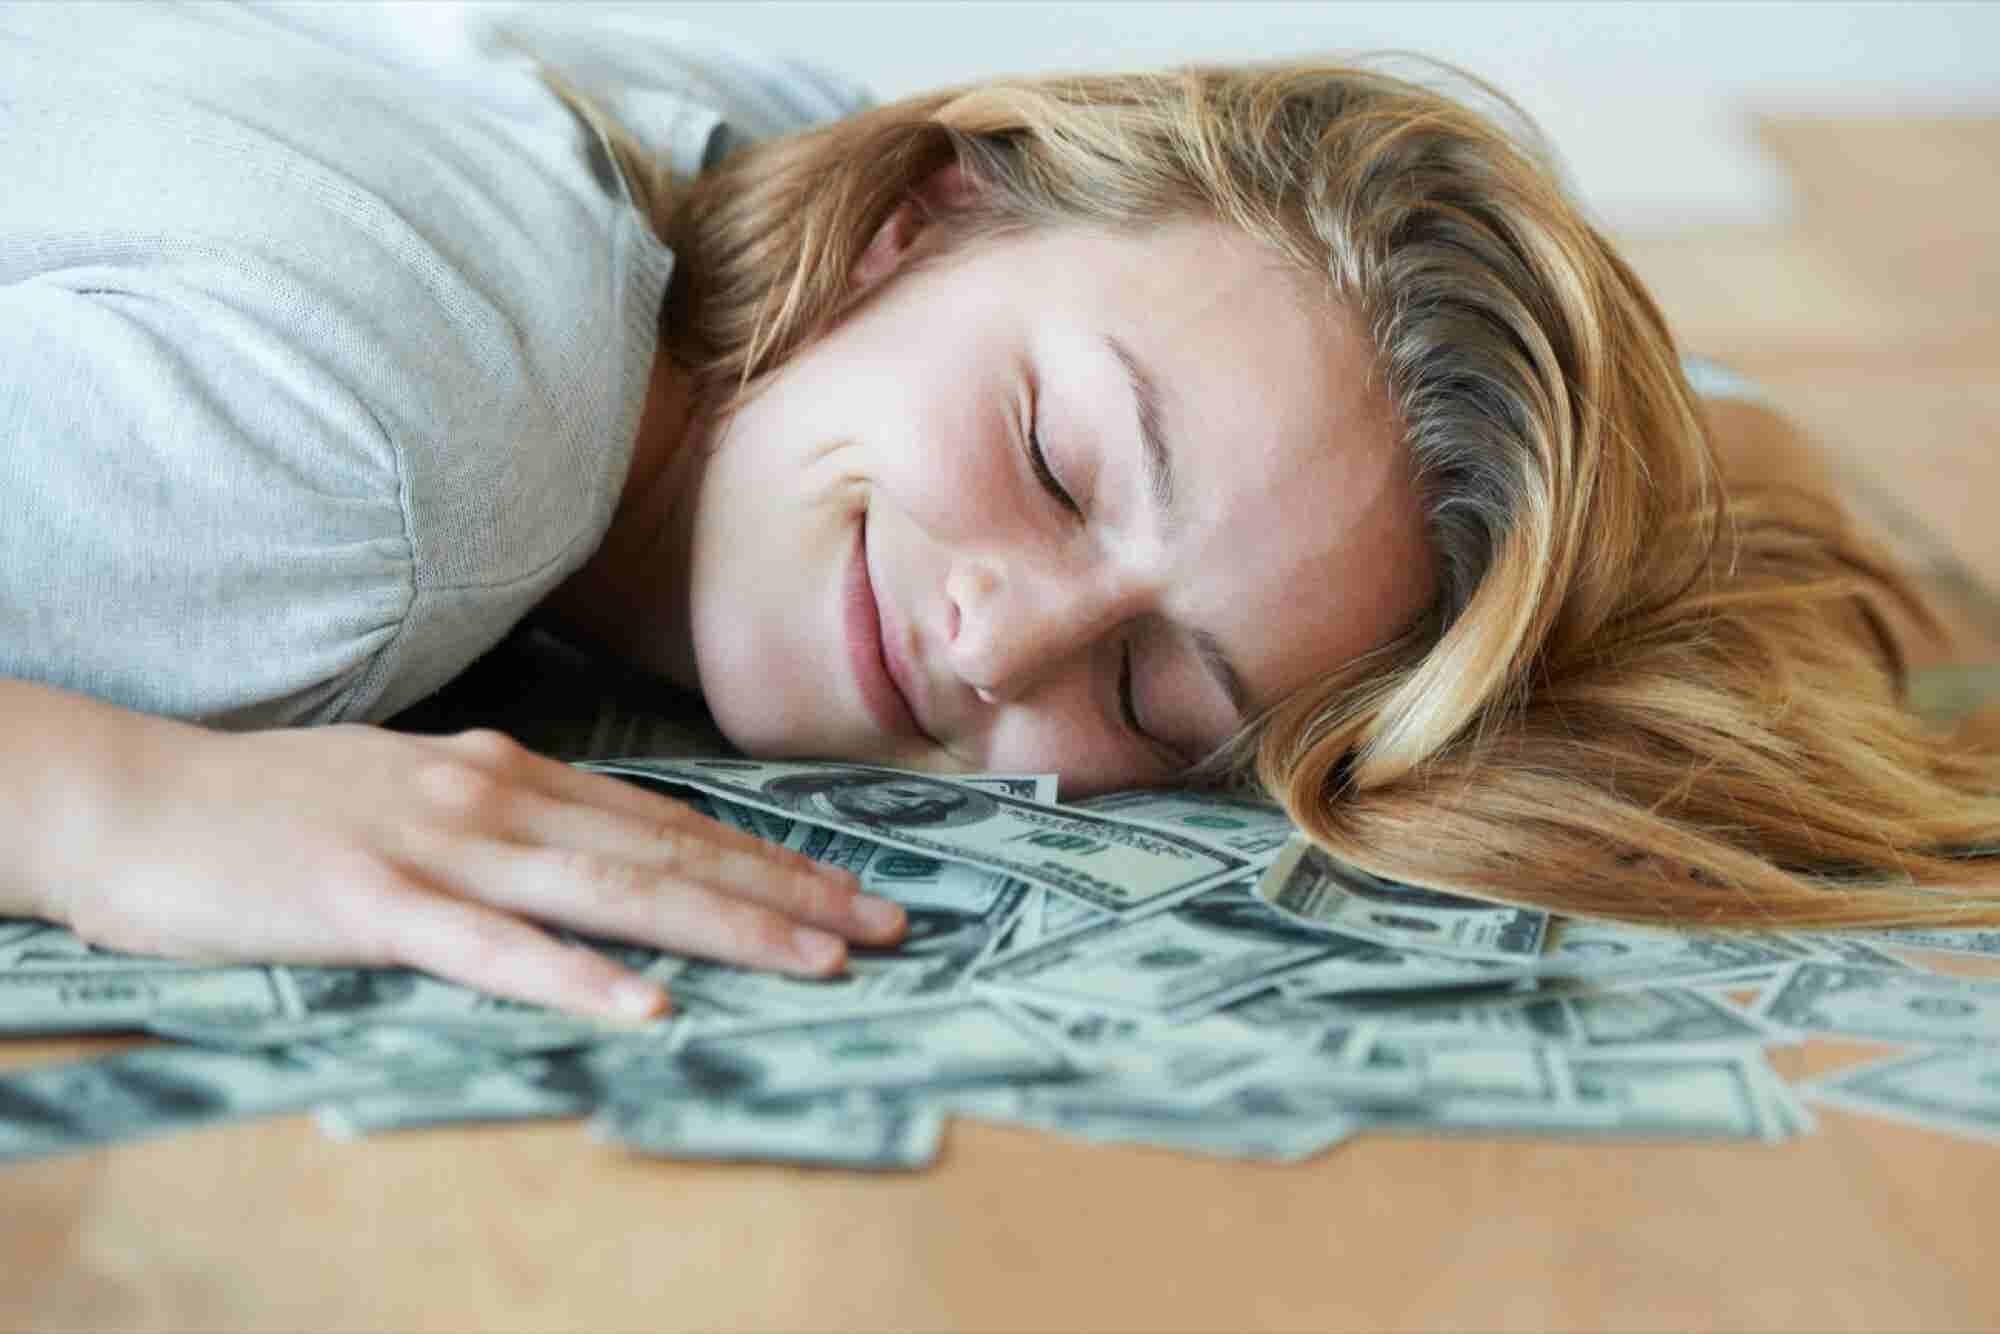 10 Ways to Make Money While You Sleep